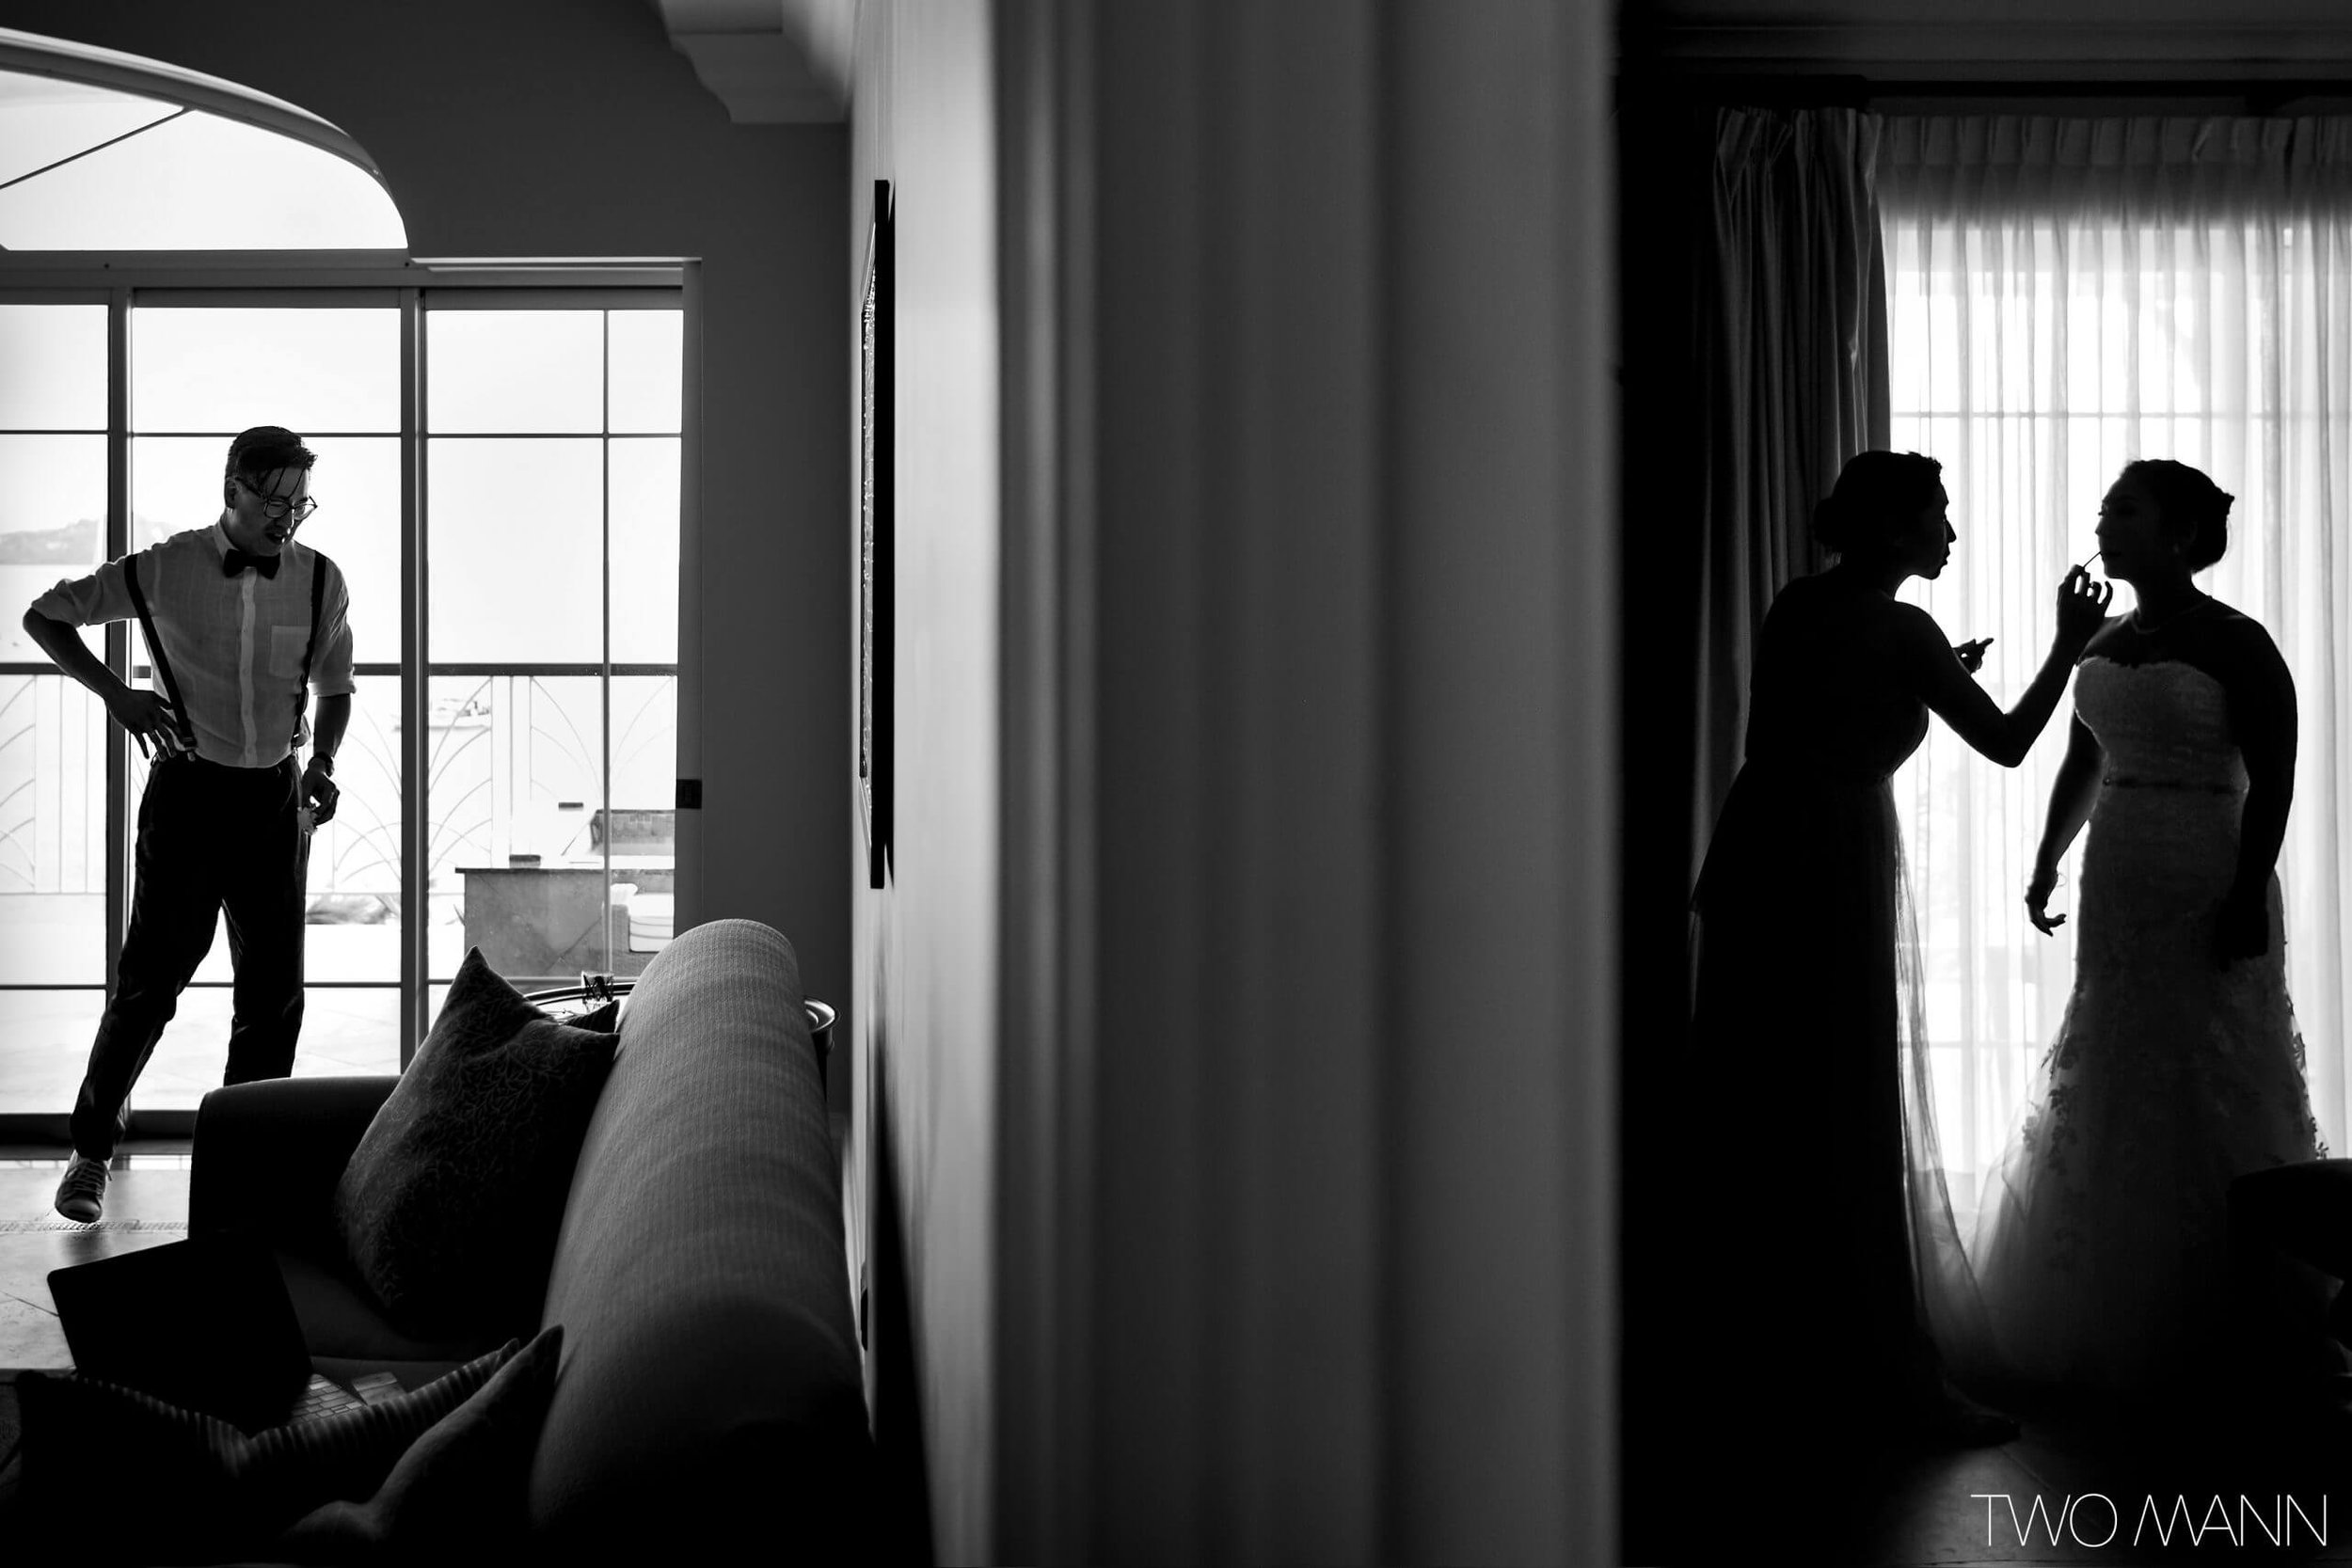 Two-Mann-Studios-Worlds-Best-Wedding-Photography-Best-of-2016-021-2560x1707.jpg